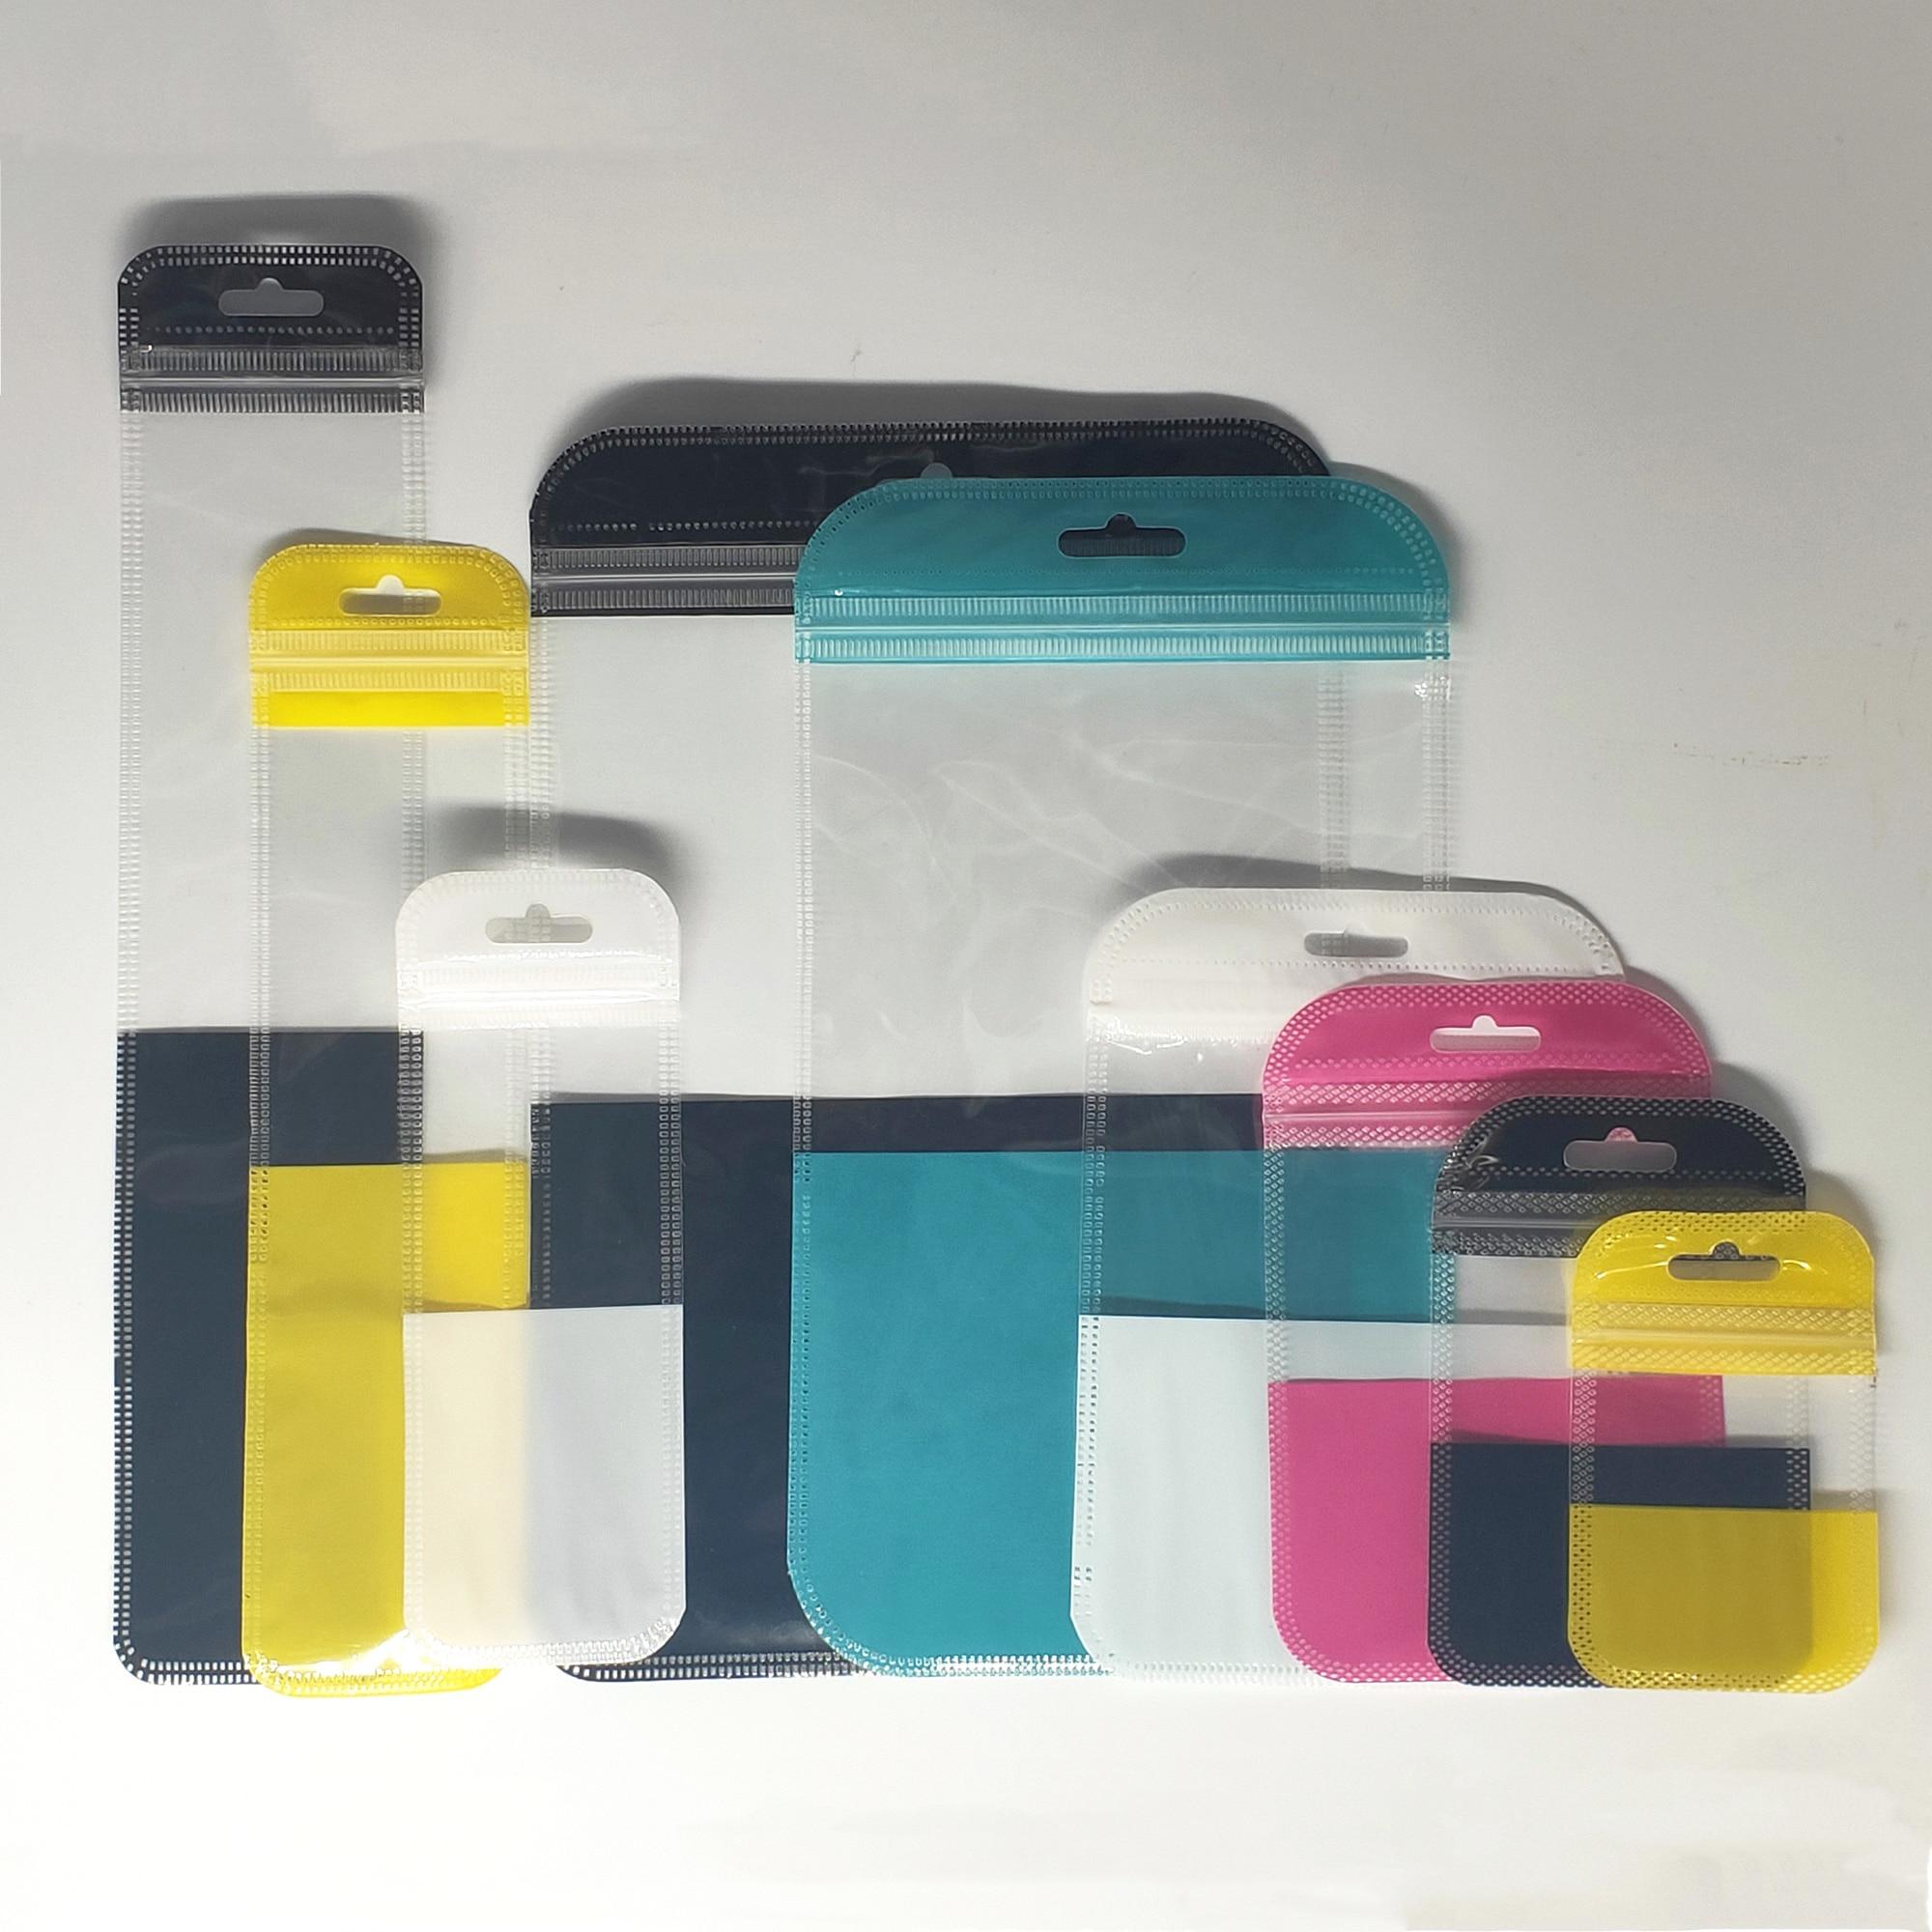 Hogar diversos plástico bolso carcasa de teléfono bolsa de almacenamiento con ziplock bolsas Cable USB bolsas planas PP bolsas de embalaje con agujero de mariposa